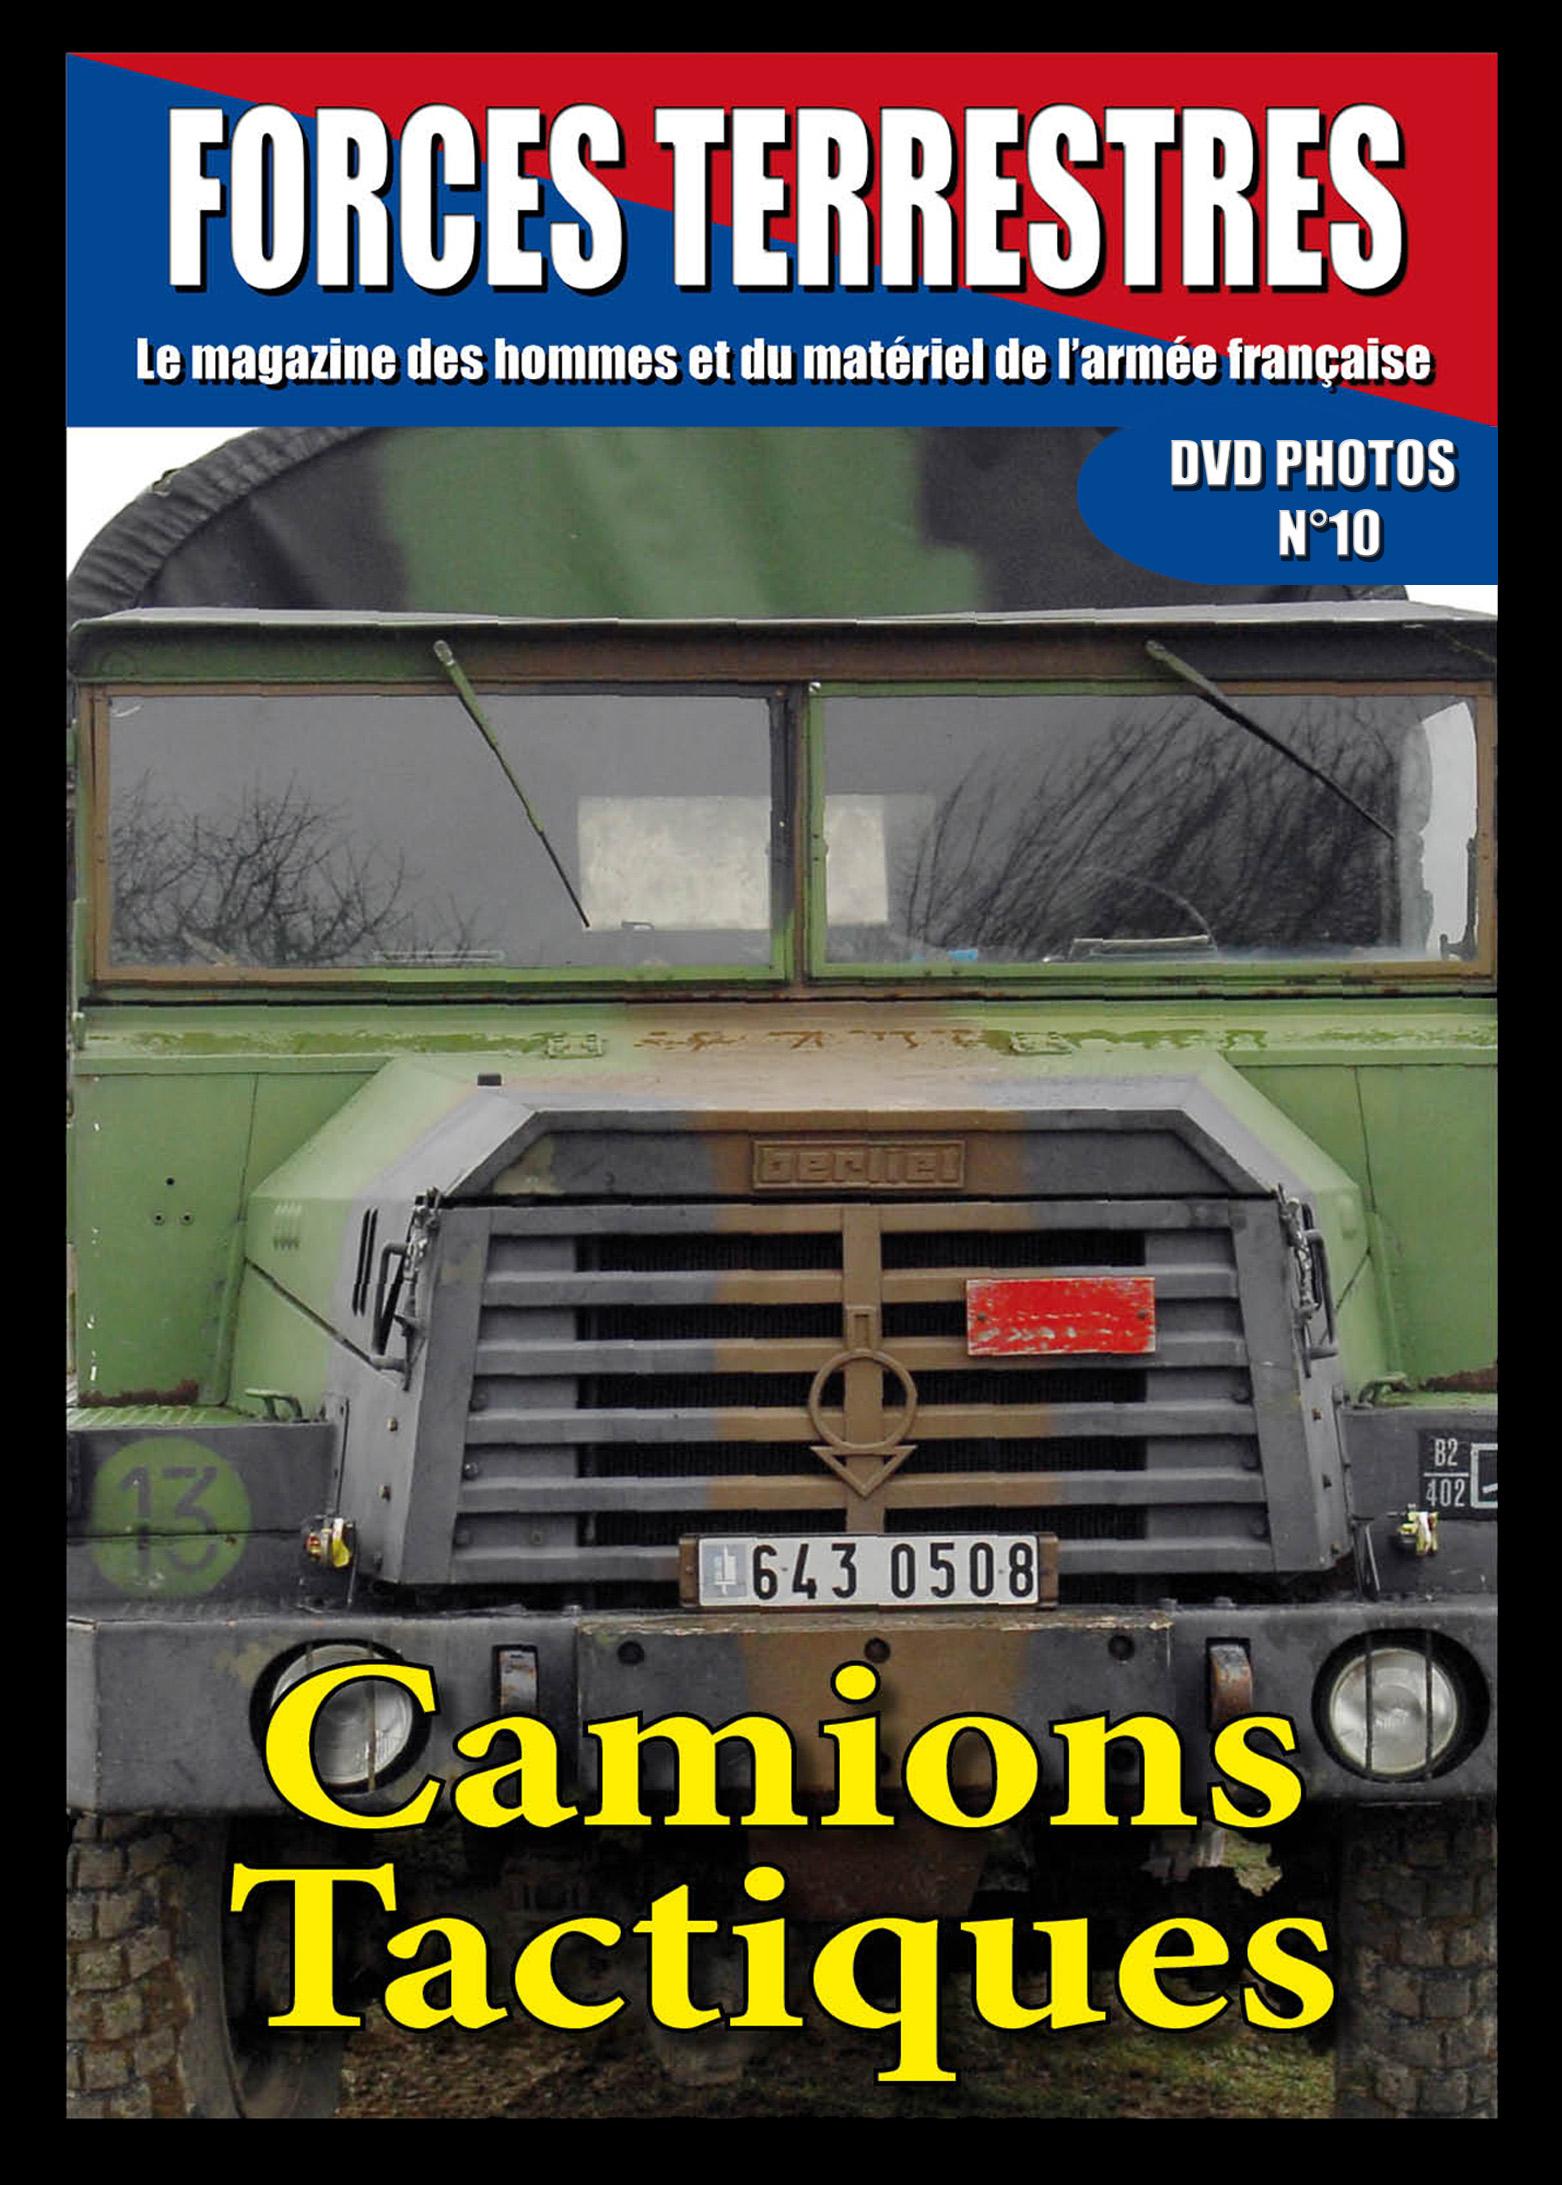 DVD  N°10 Camions Tactiques